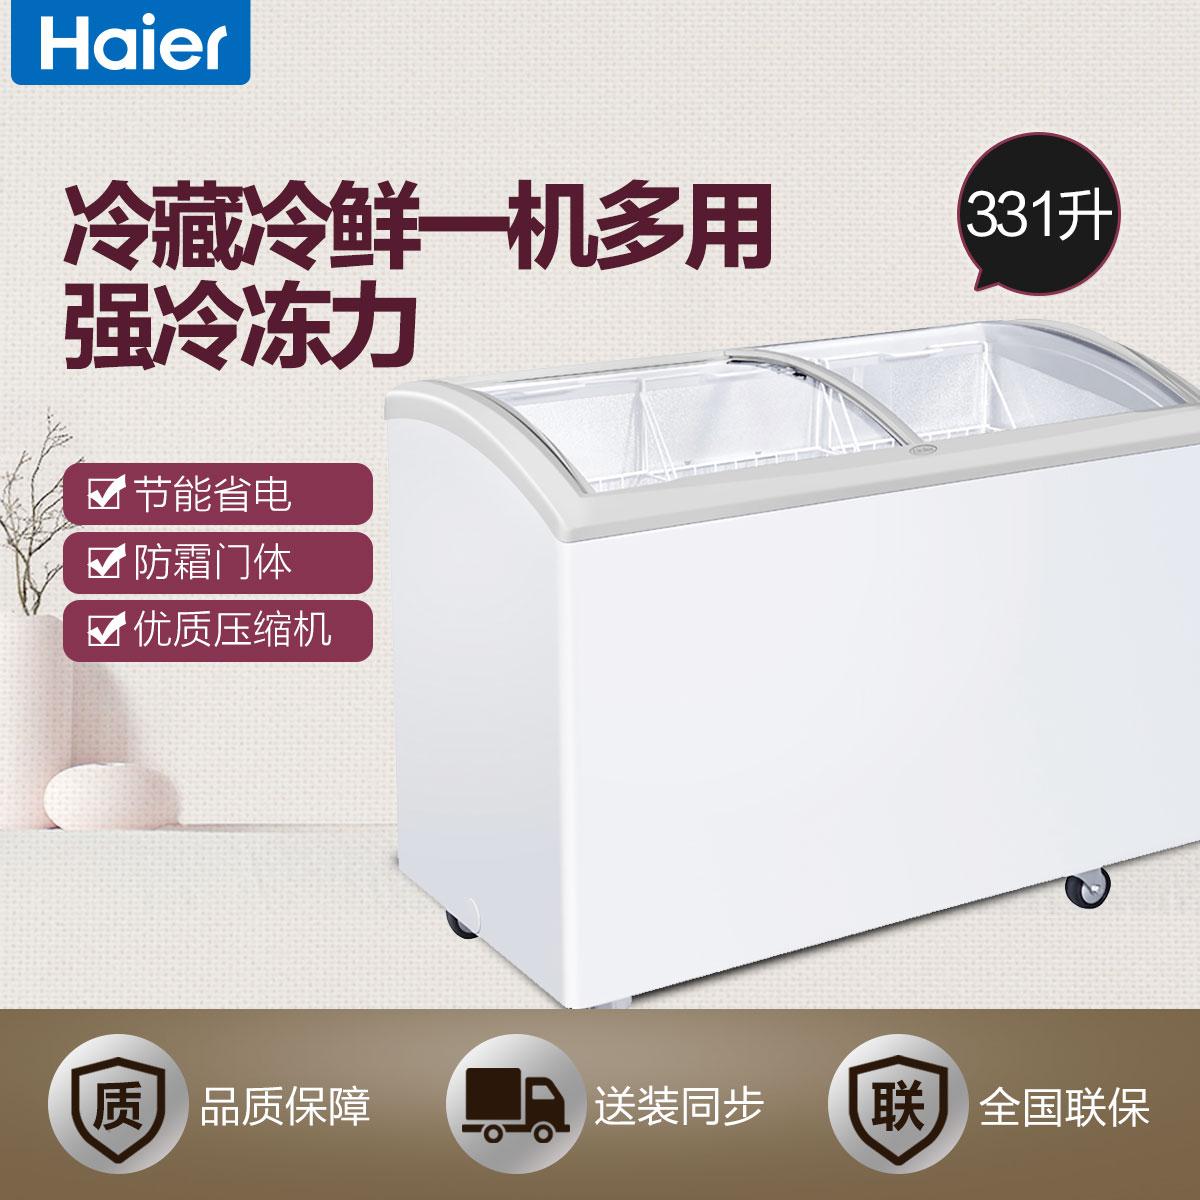 Haier/海尔 展示柜 SC/SD-331CDS 331升大容积卧式冰柜 圆弧玻璃门雪糕柜 商用冷冻展示柜